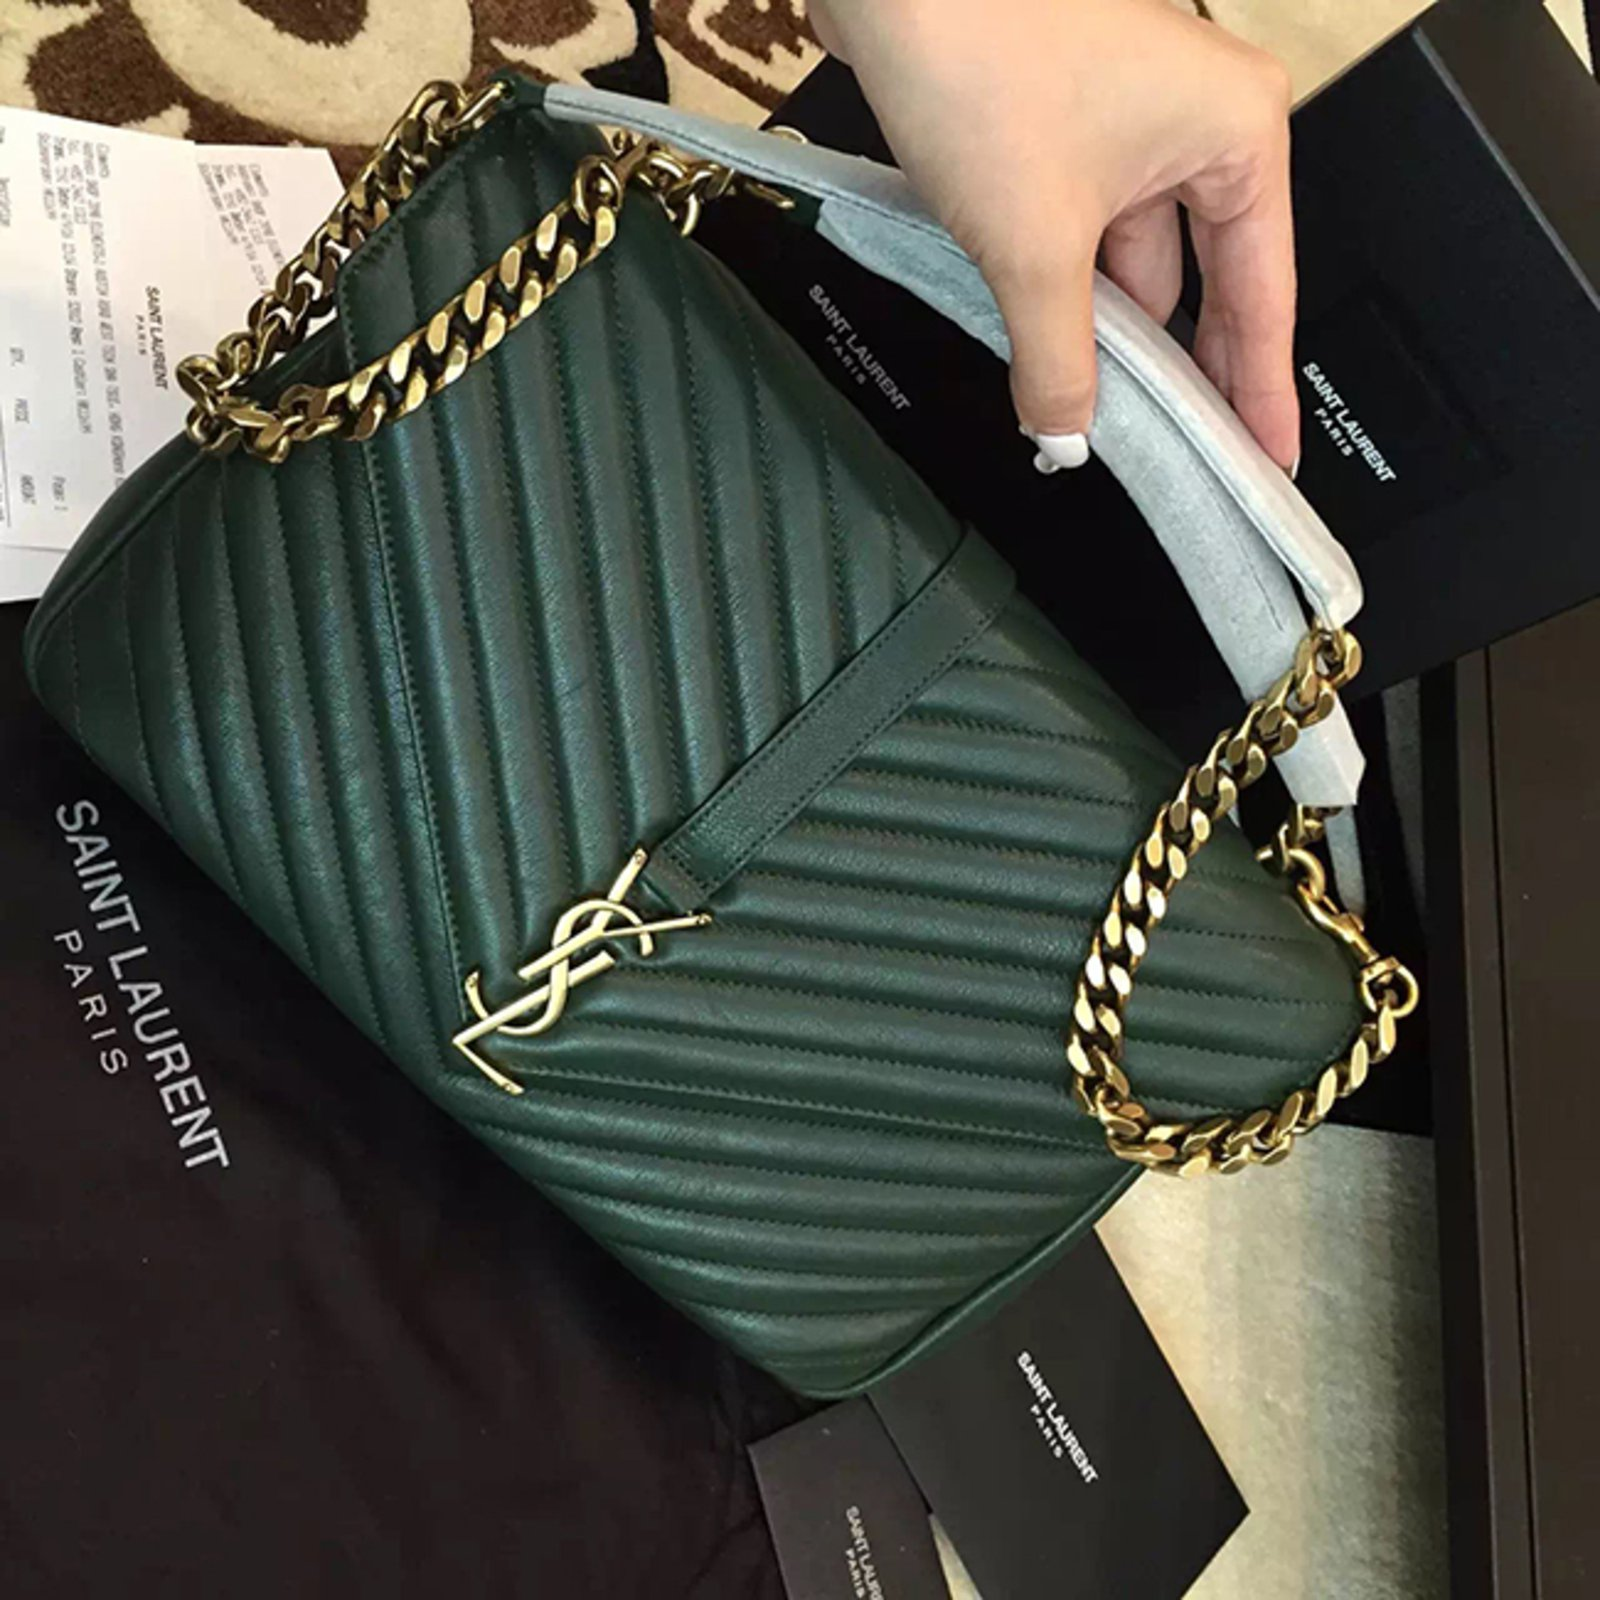 be73b9e3b743 Yves Saint Laurent YSL green college chain shoulder bag medium Handbags  Leather Green ref.57110 - Joli Closet